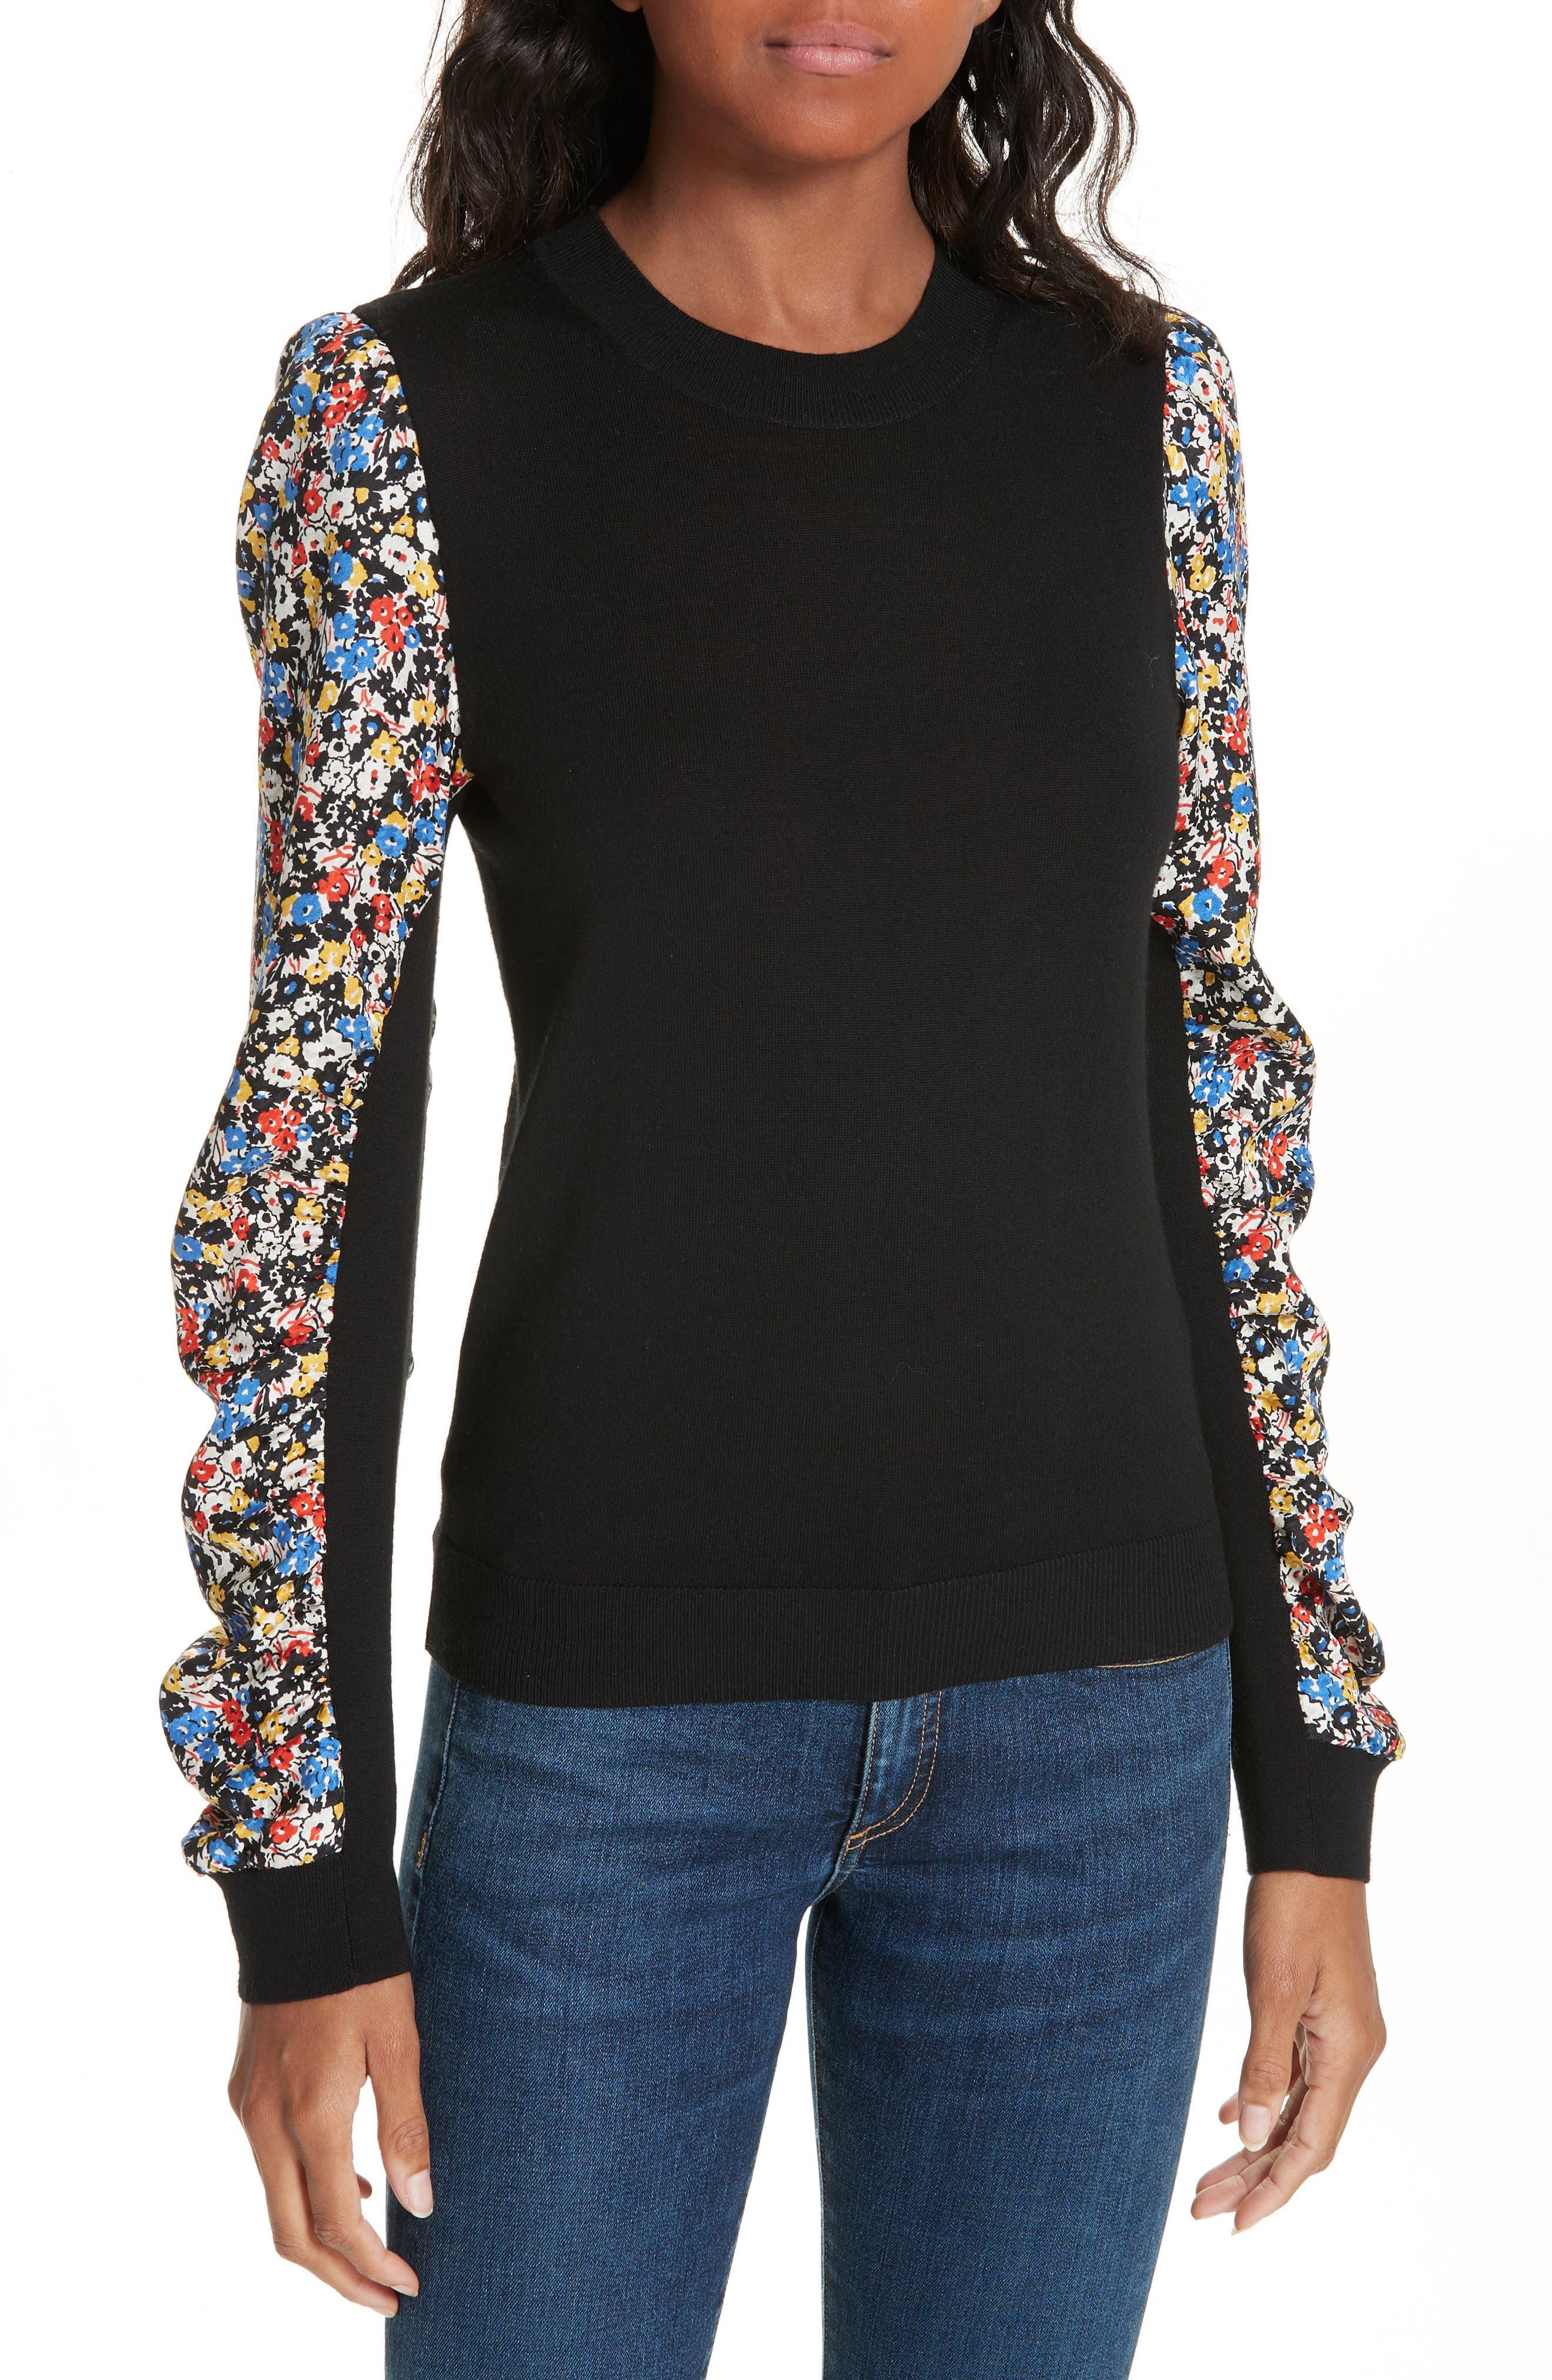 Adler Stretch Silk Sleeve Merino Wool Sweater,                         Main,                         color, BLACK FLORAL